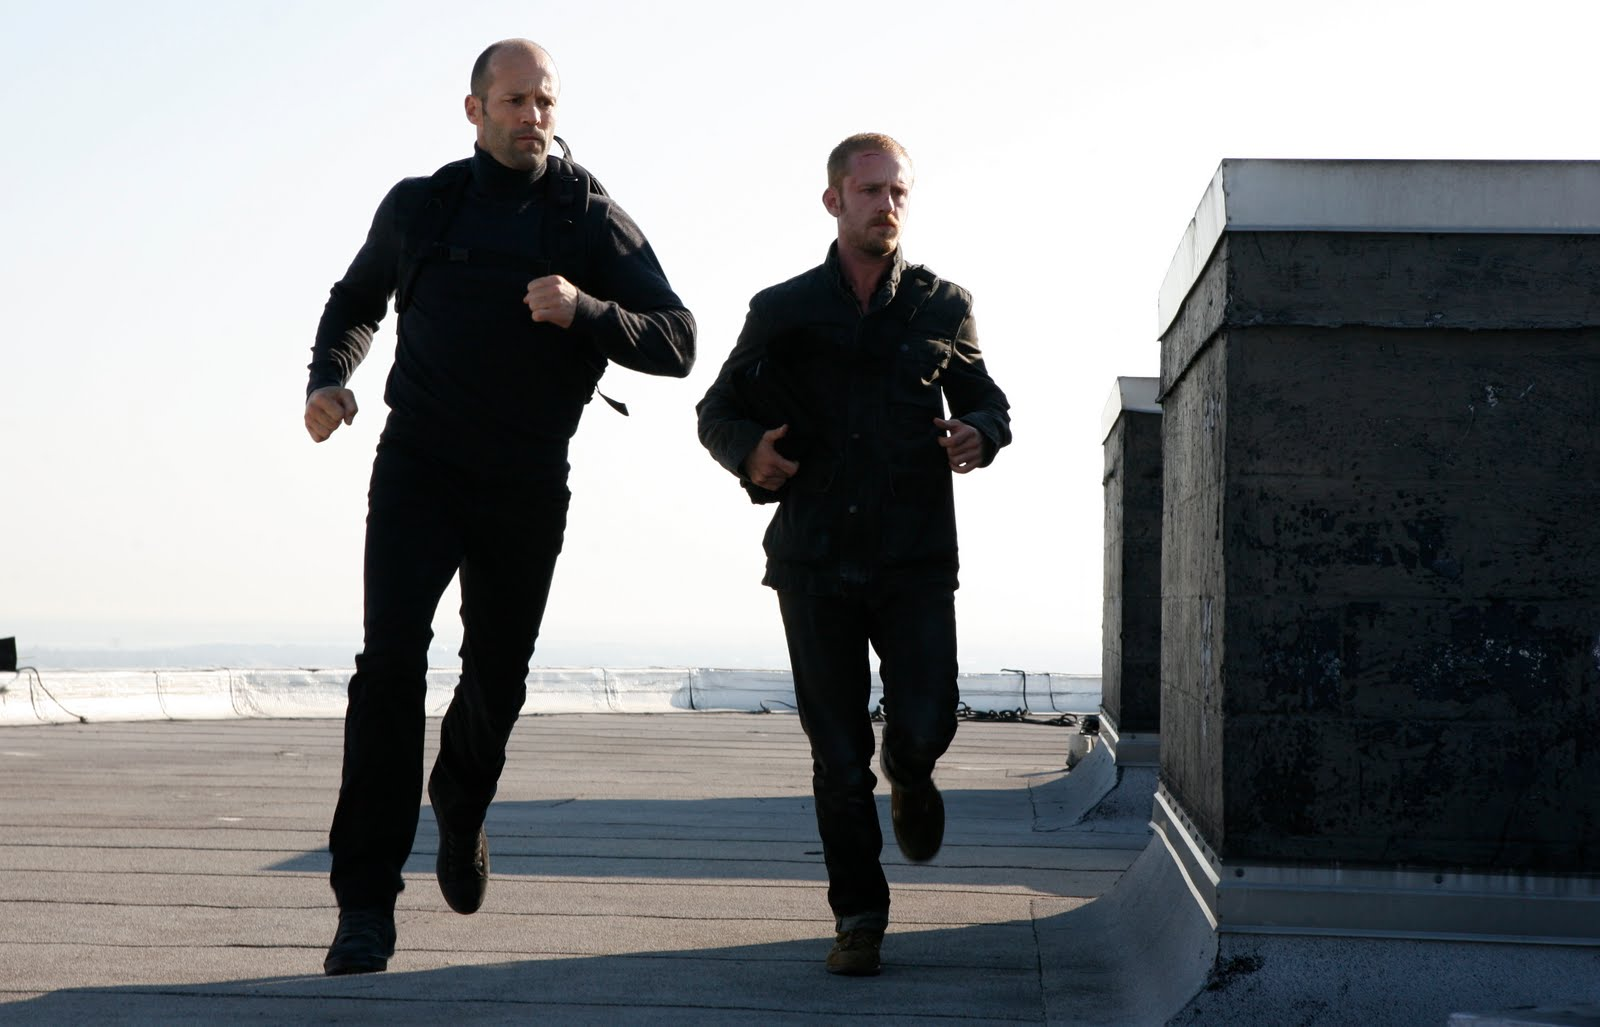 http://3.bp.blogspot.com/_CiYQ7QxeyWs/TQiHXzTNSWI/AAAAAAAAKI4/eJELtBZLqnY/s1600/The-Mechanic-movie-image-Ben-Foster-Jason-Statham-2.jpg